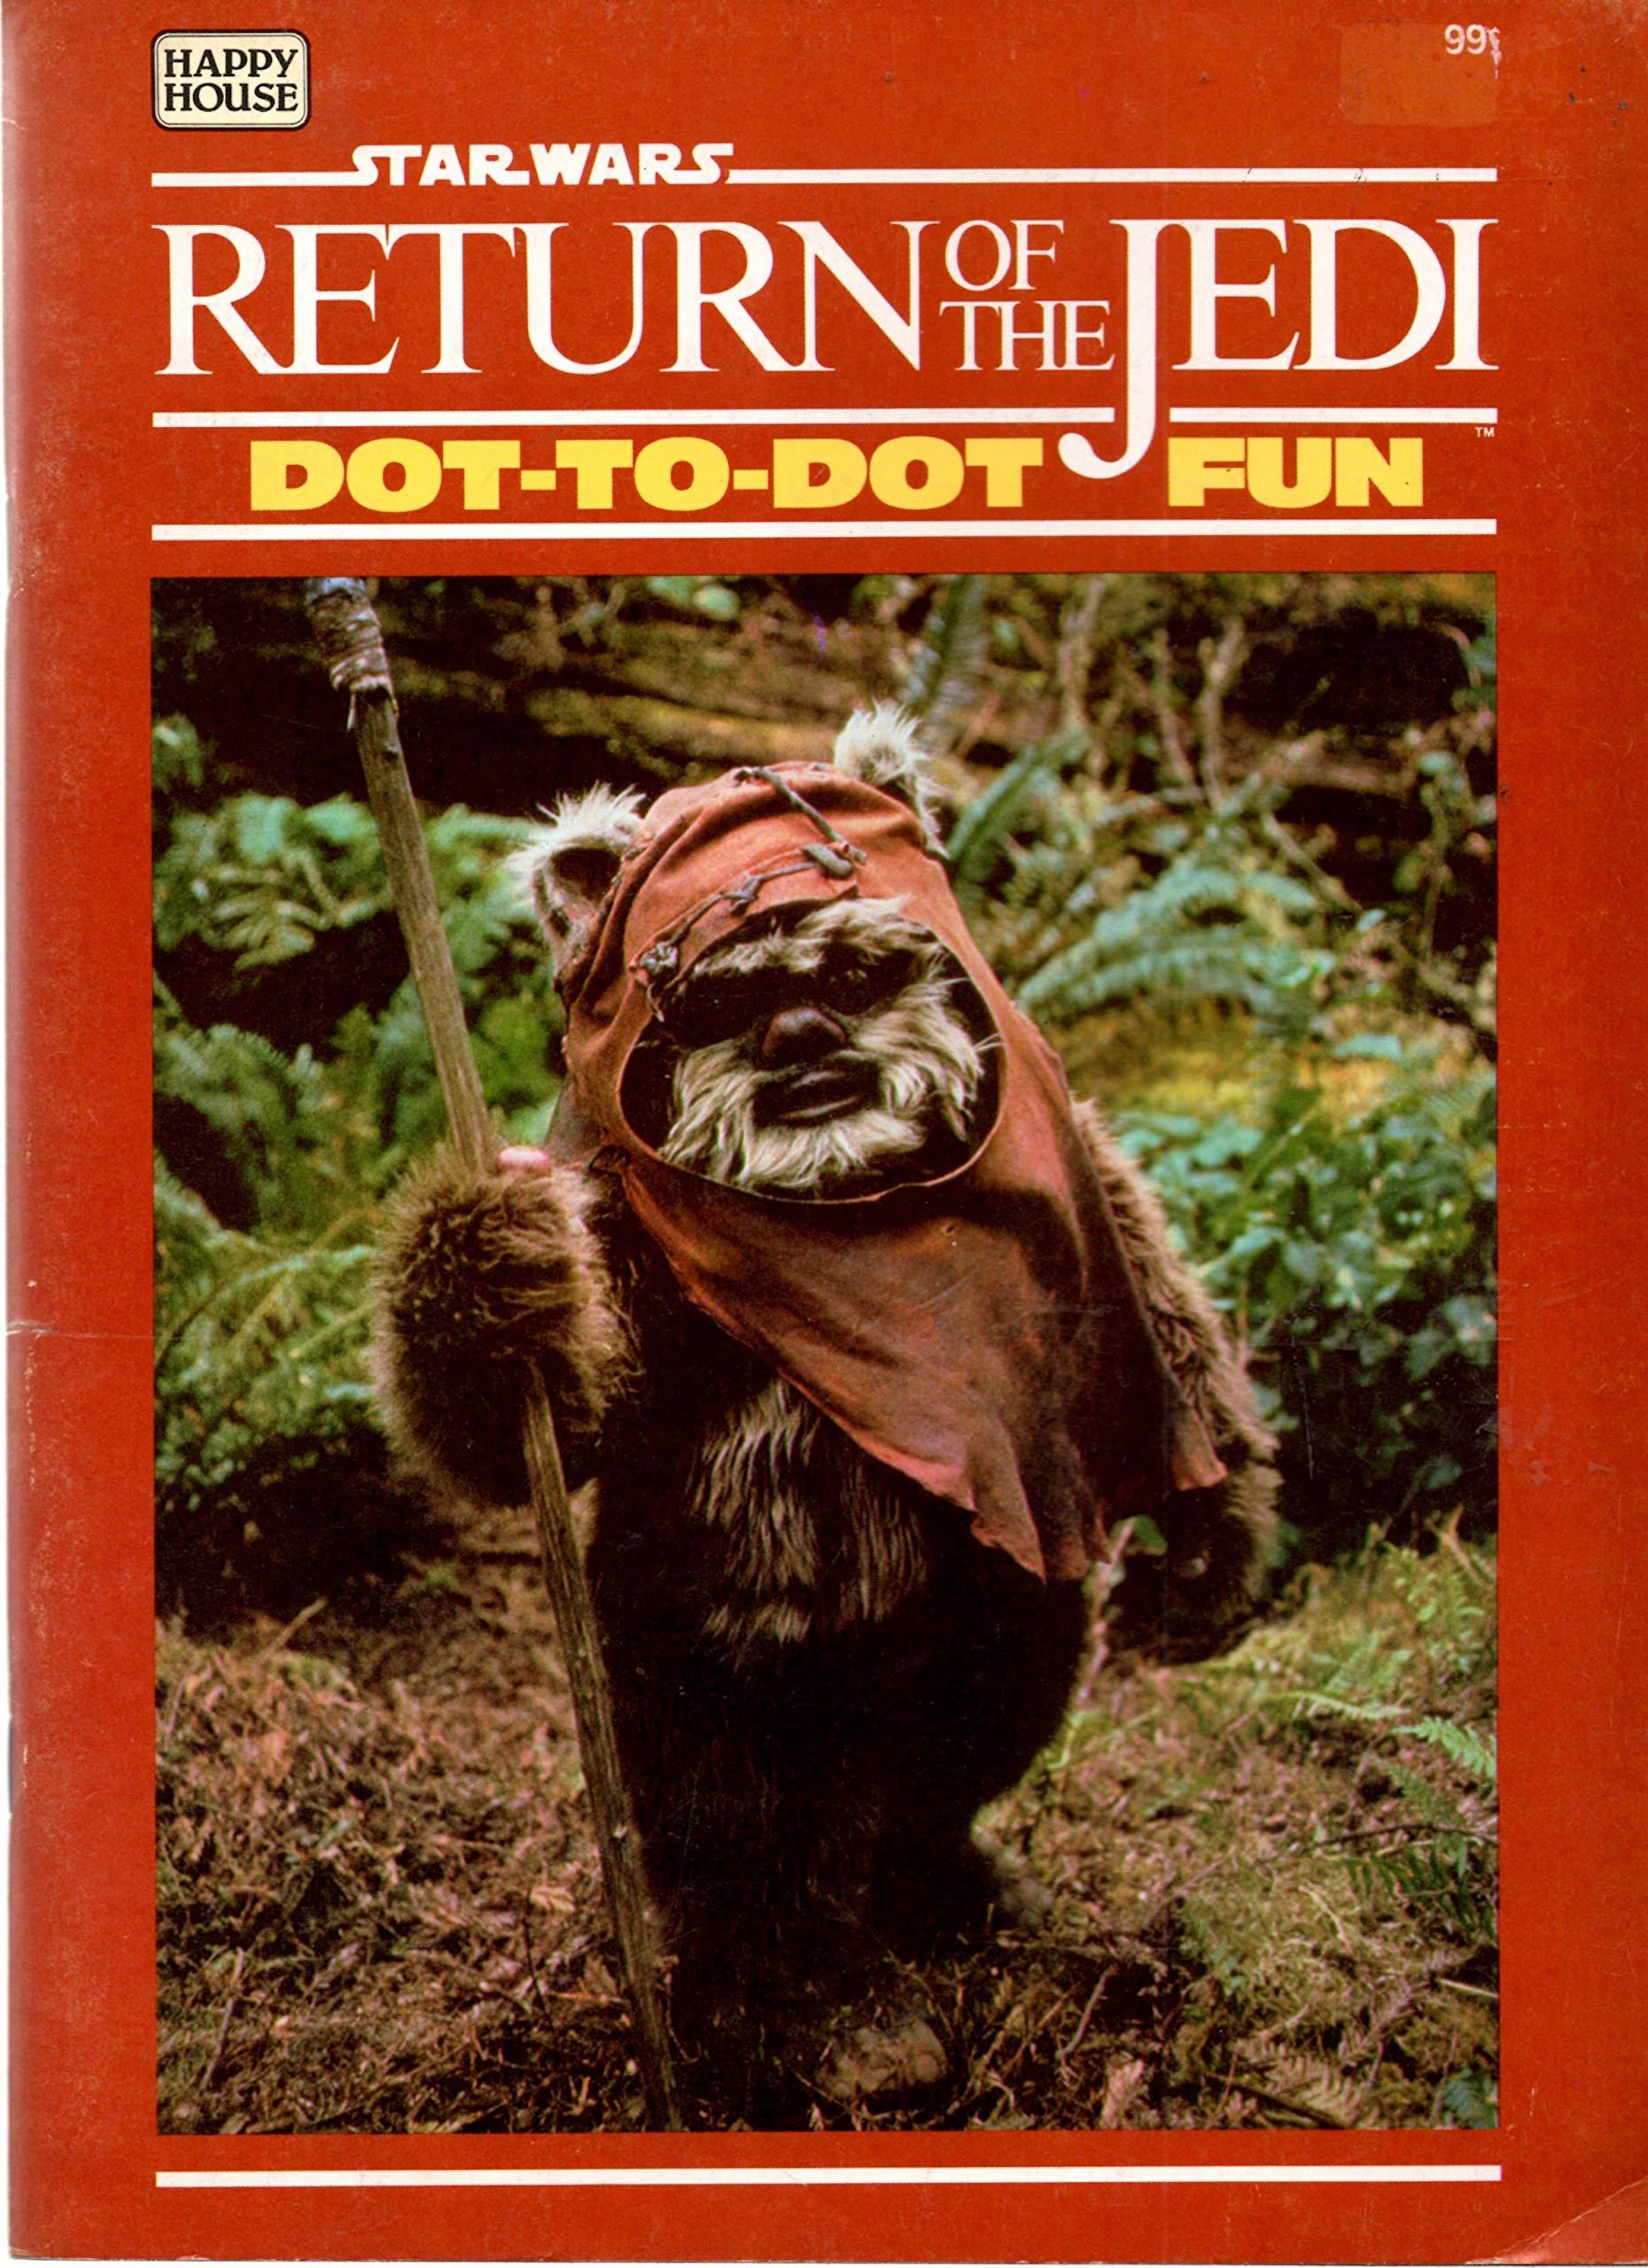 Star Wars Return of the Jedi: Dot-to-Dot Fun